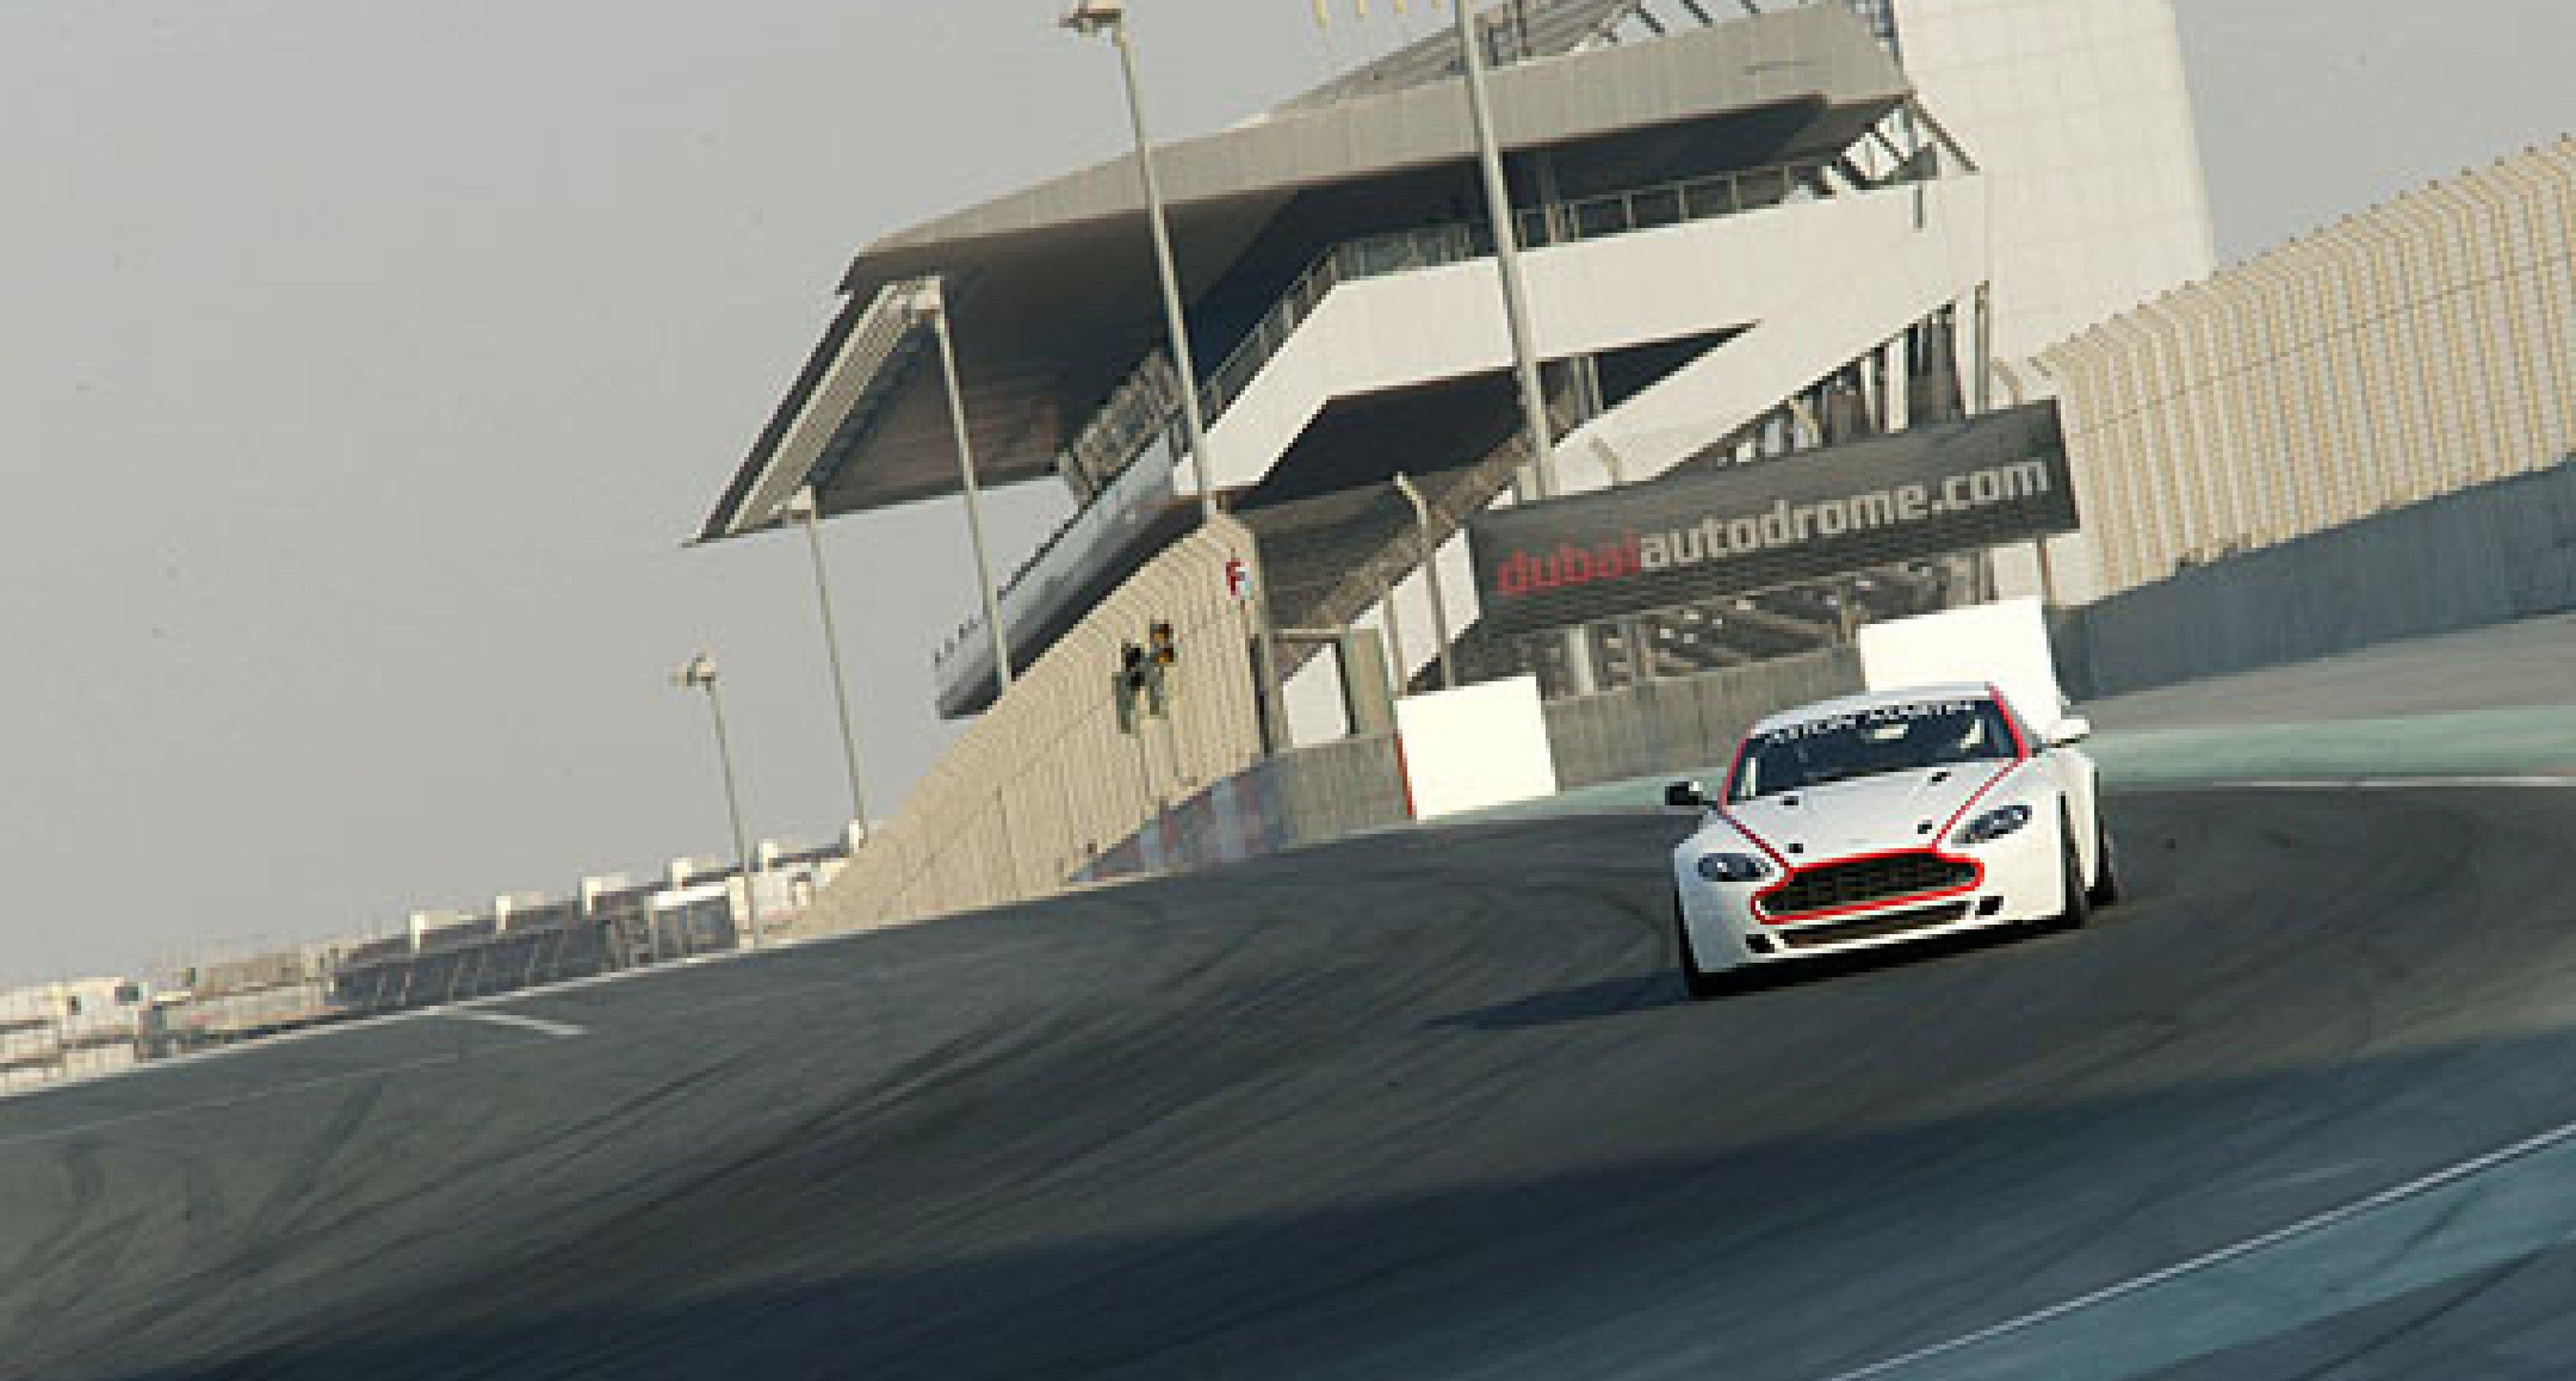 4.7-litre Vantage GT4 replaces N24 as Aston Martin's Production Racer